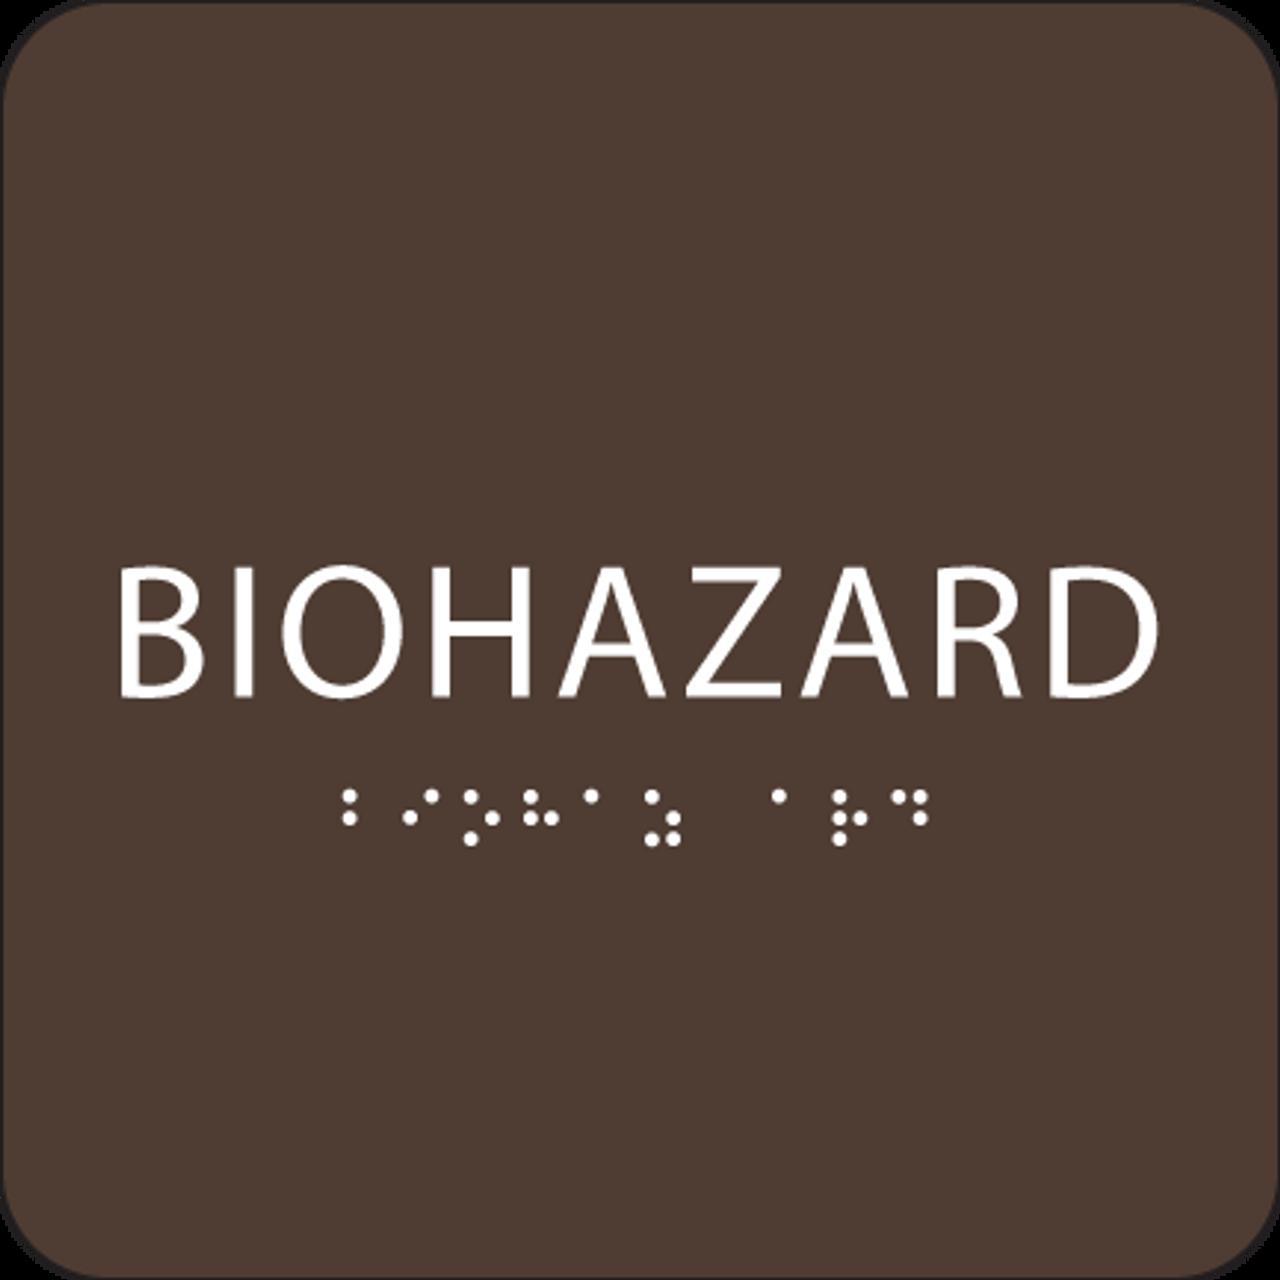 Dark Brown Biohazard ADA Sign